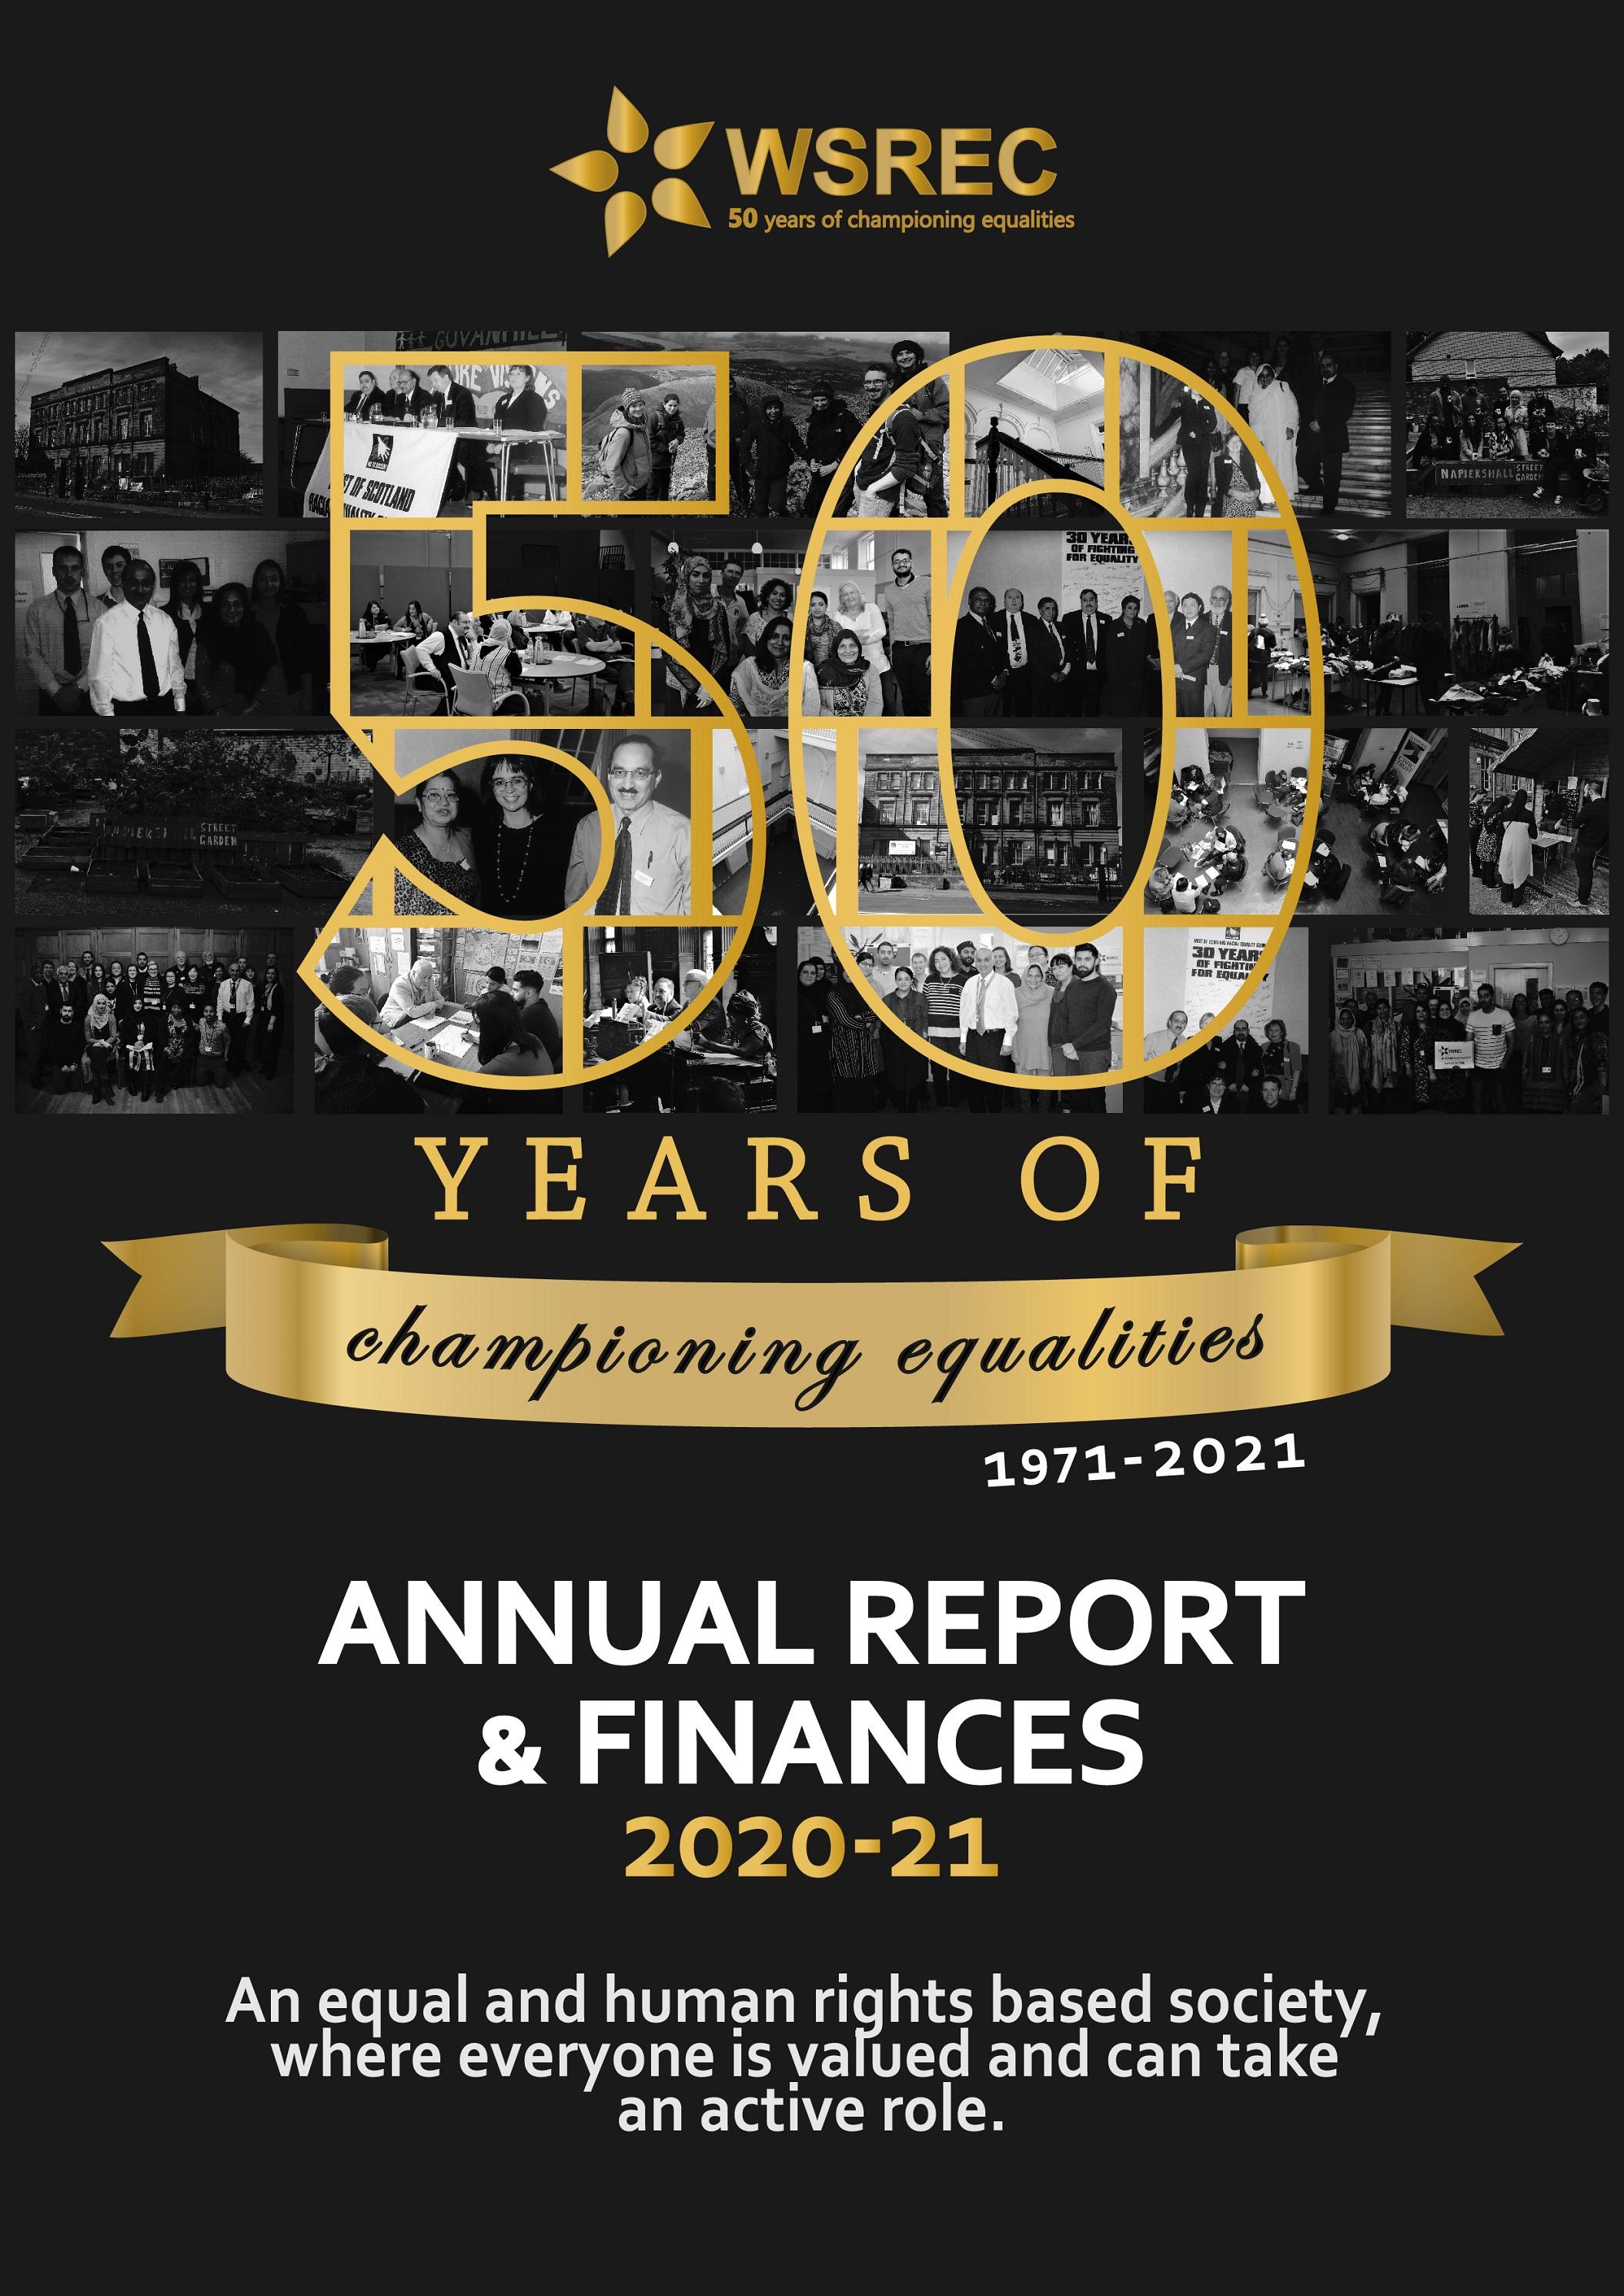 WSREC Annual Report Cover 20-21